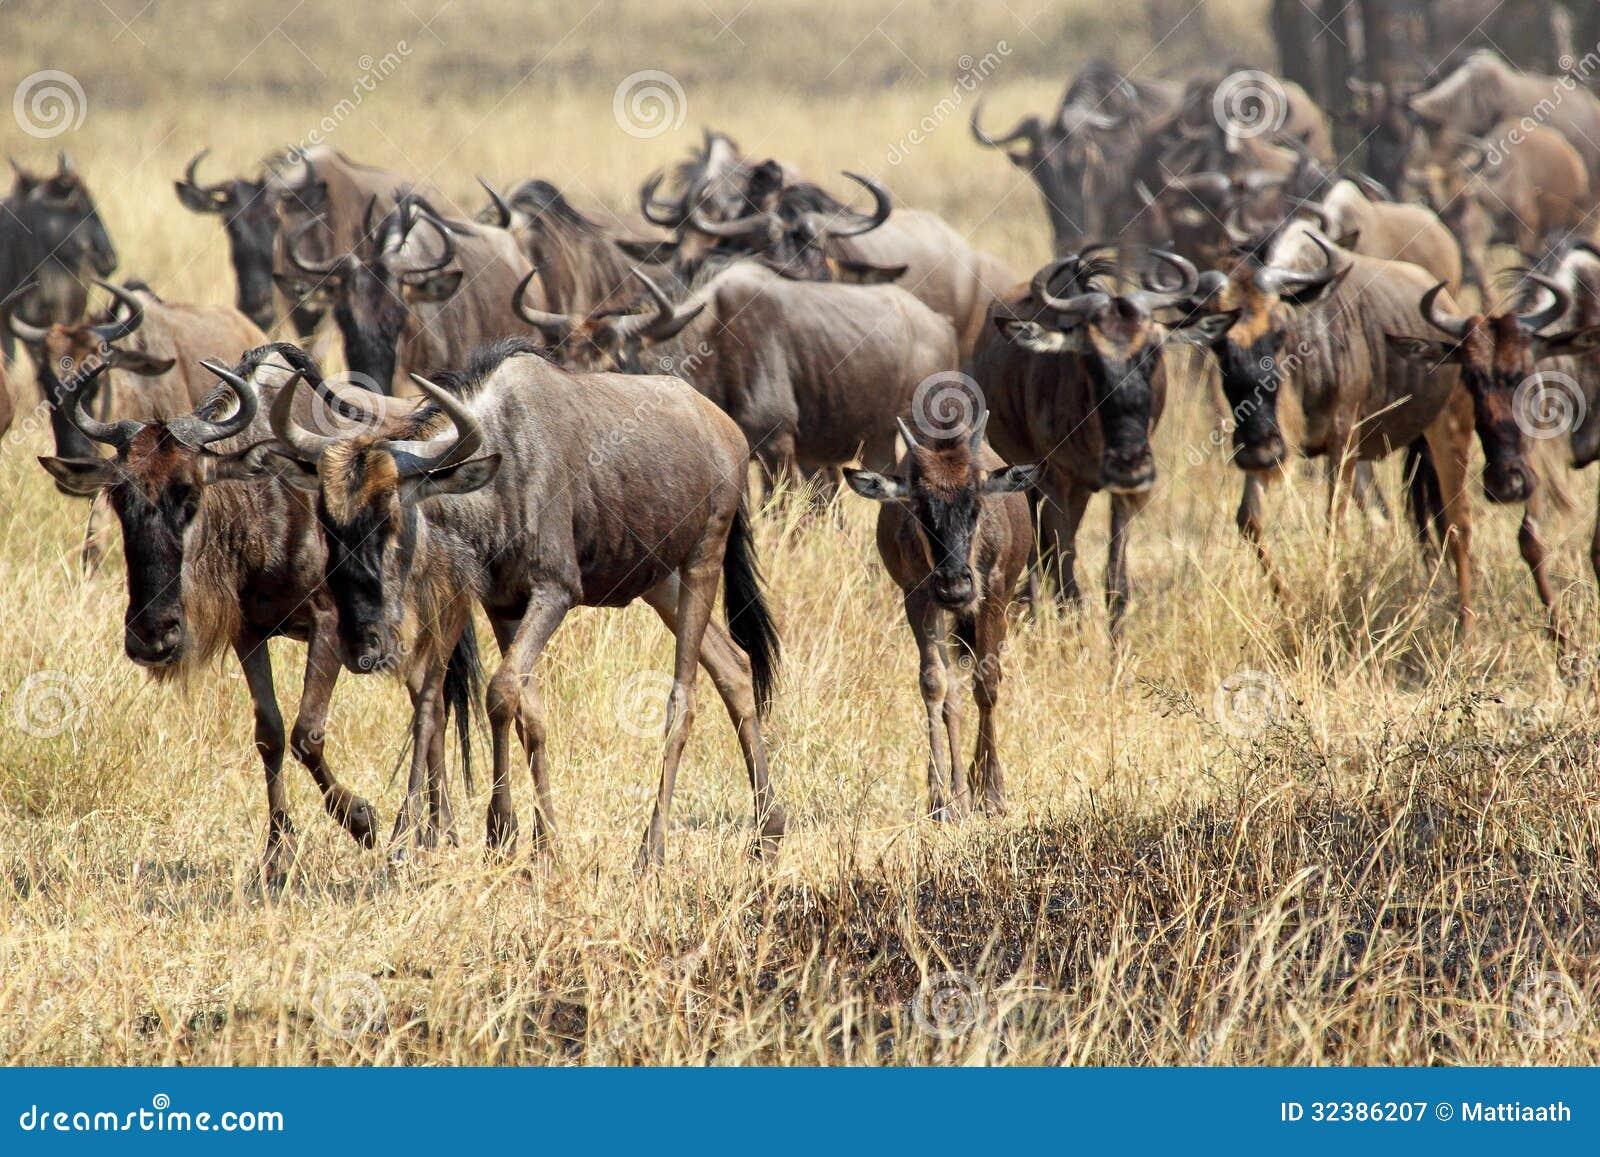 Serengeti great migration youtube downloader